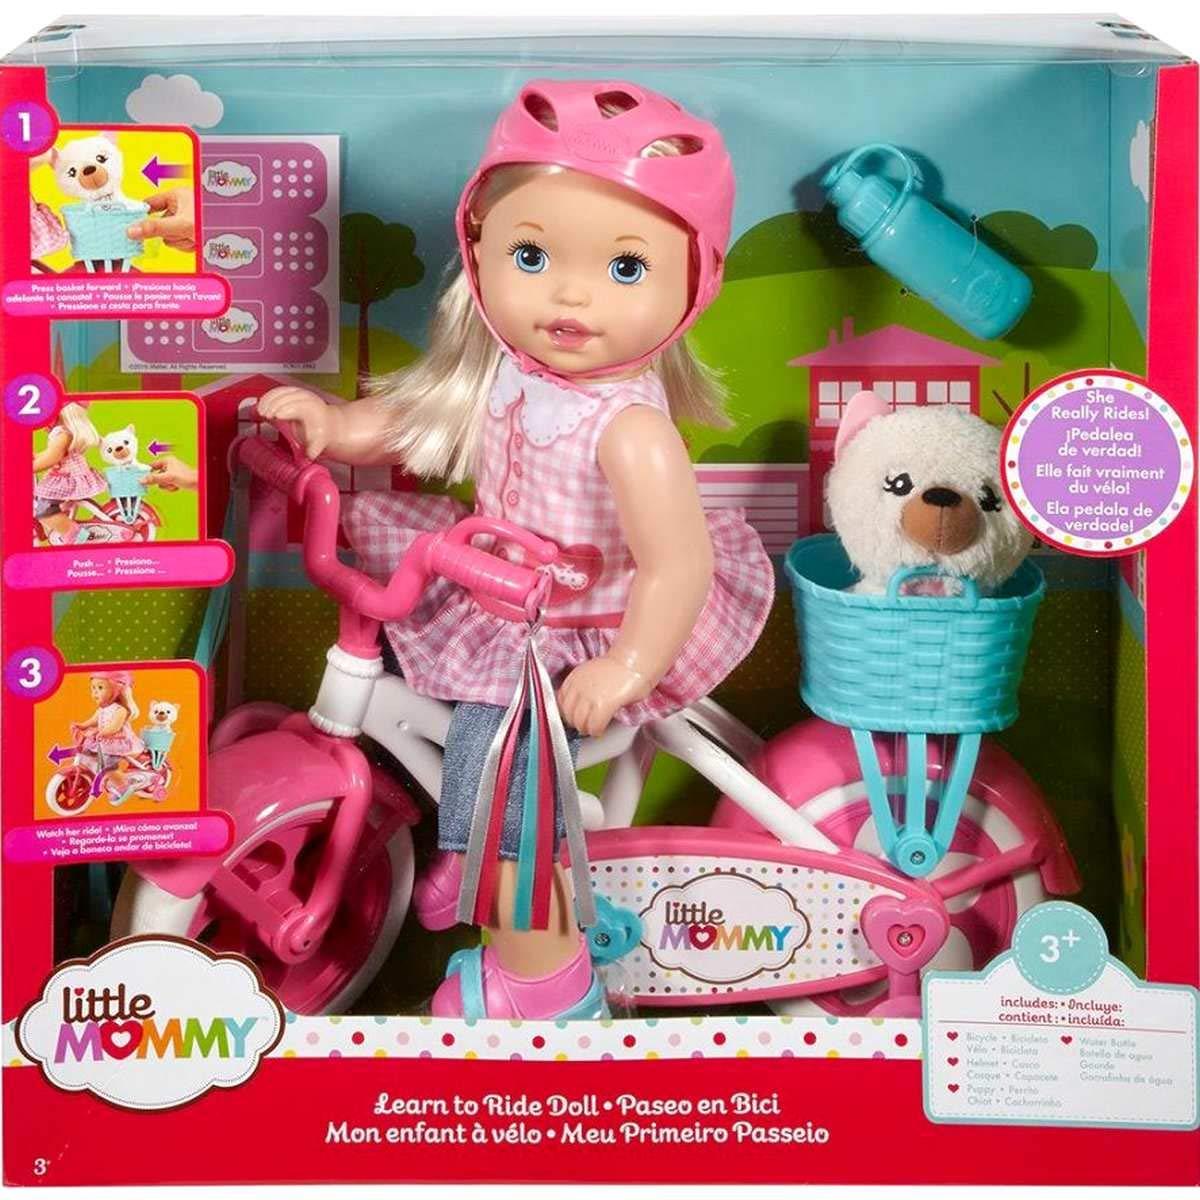 Boneca Little Mommy Meu Primeiro Passeio - Mattel